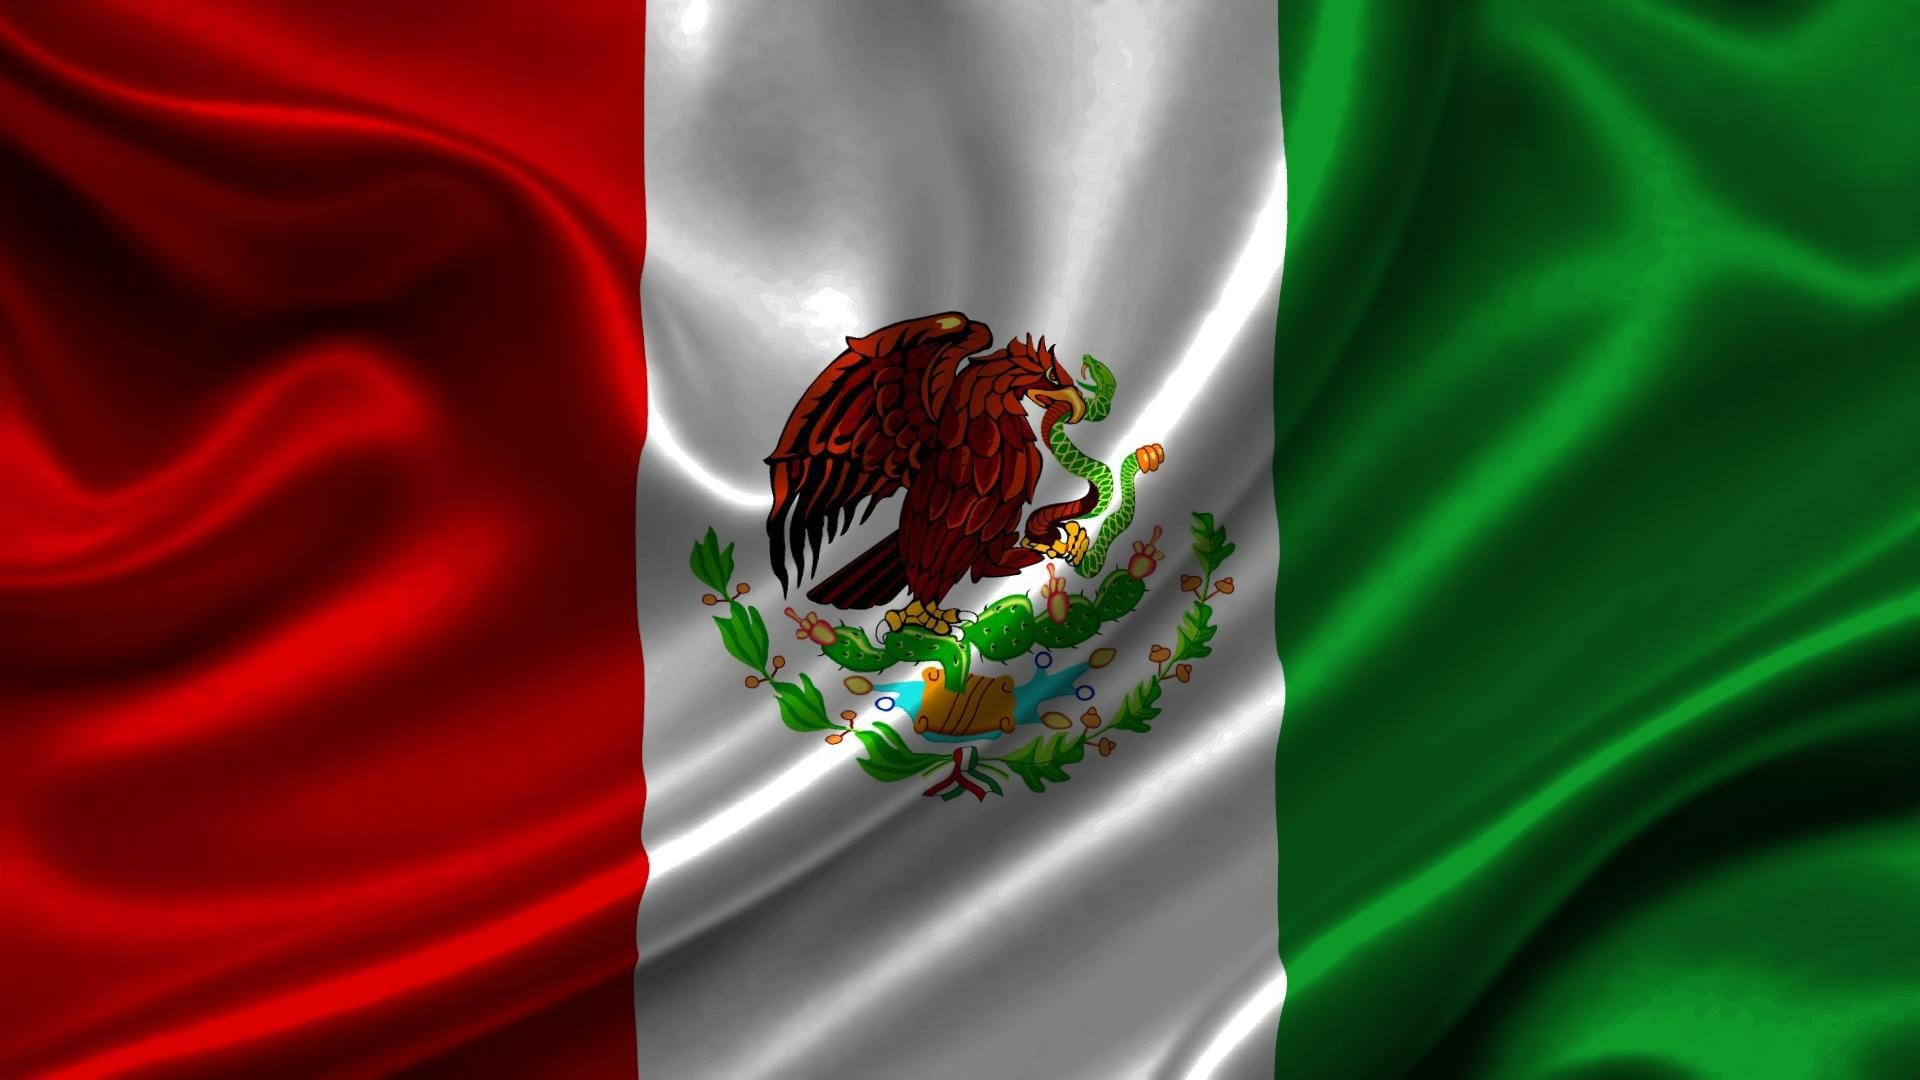 7764 mexican flag wallpaper 1920x1080